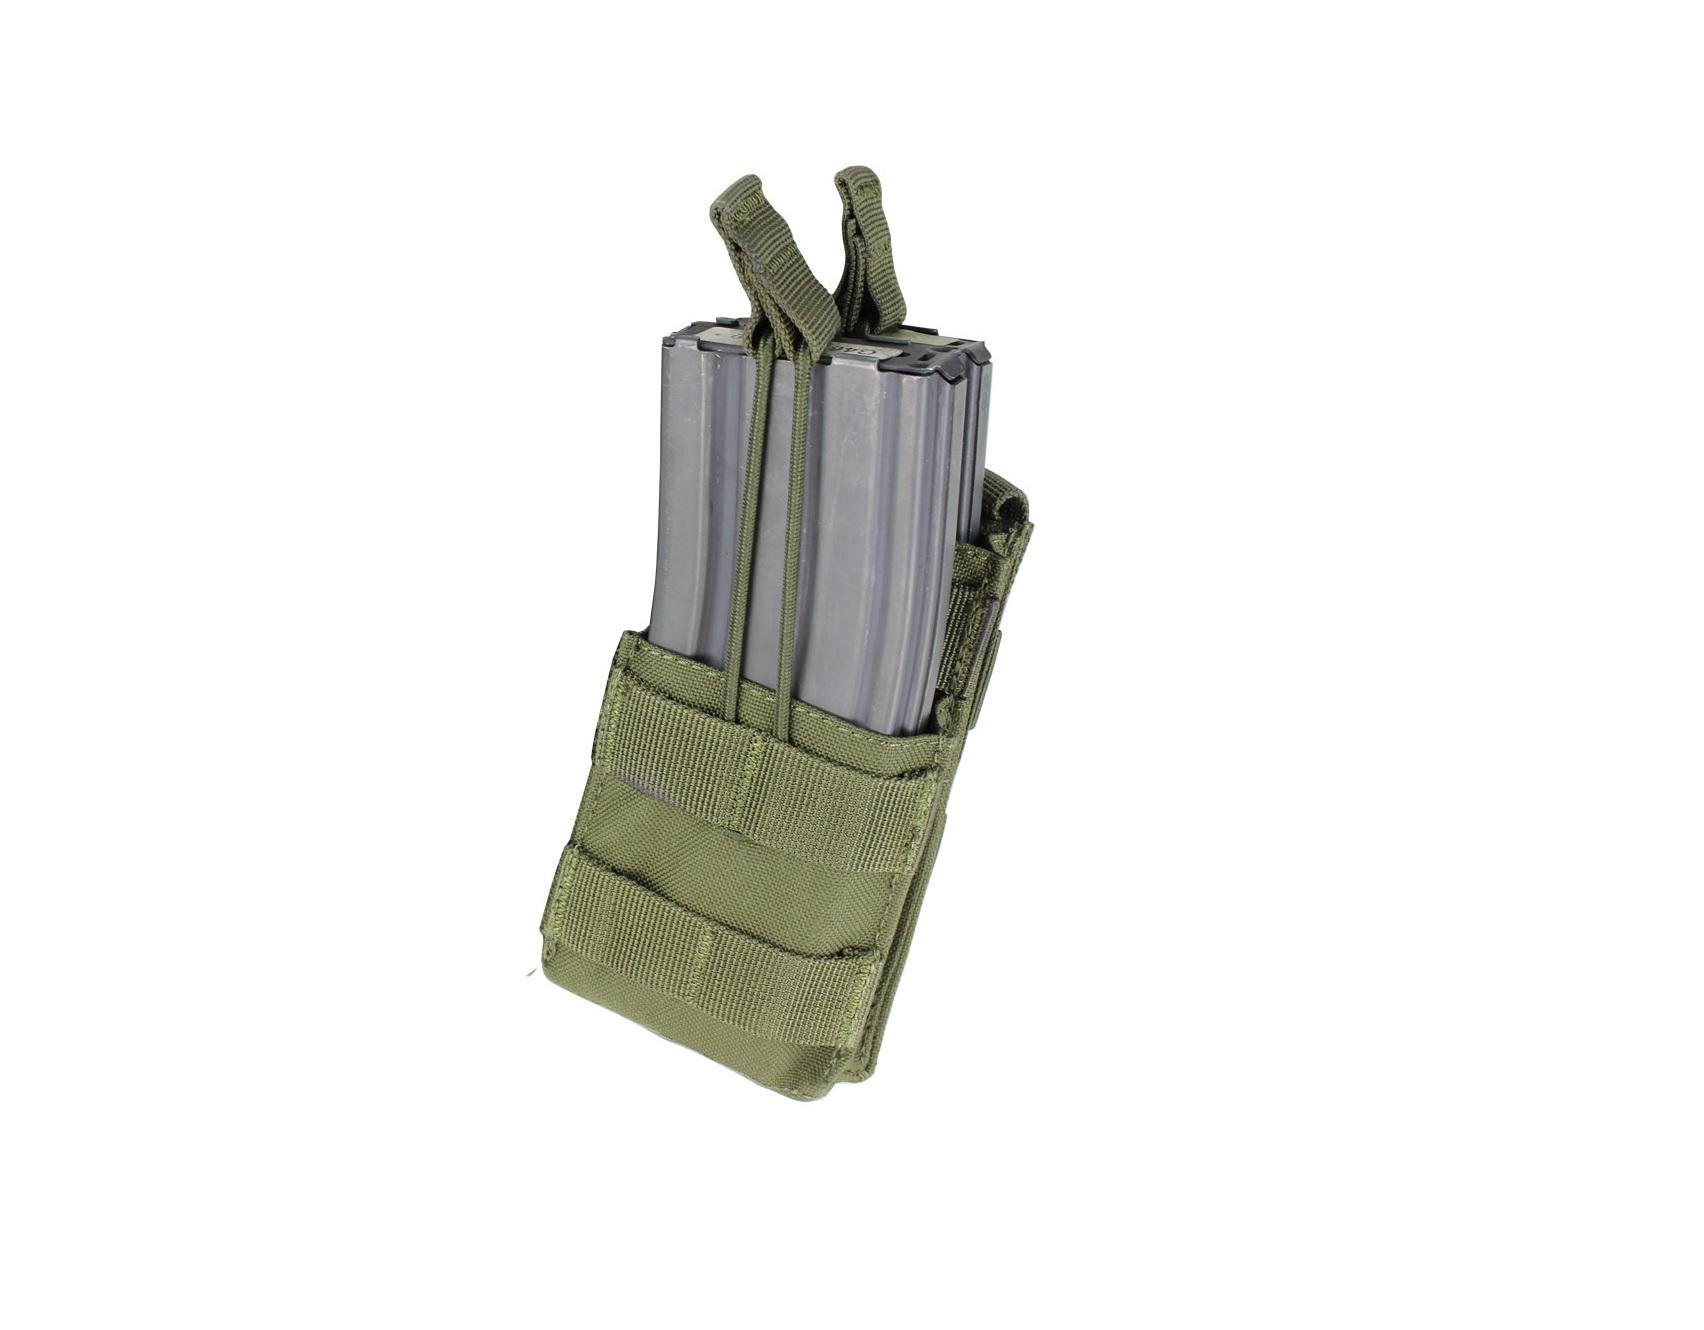 POUCH SINGLE STACKER M4 - OD